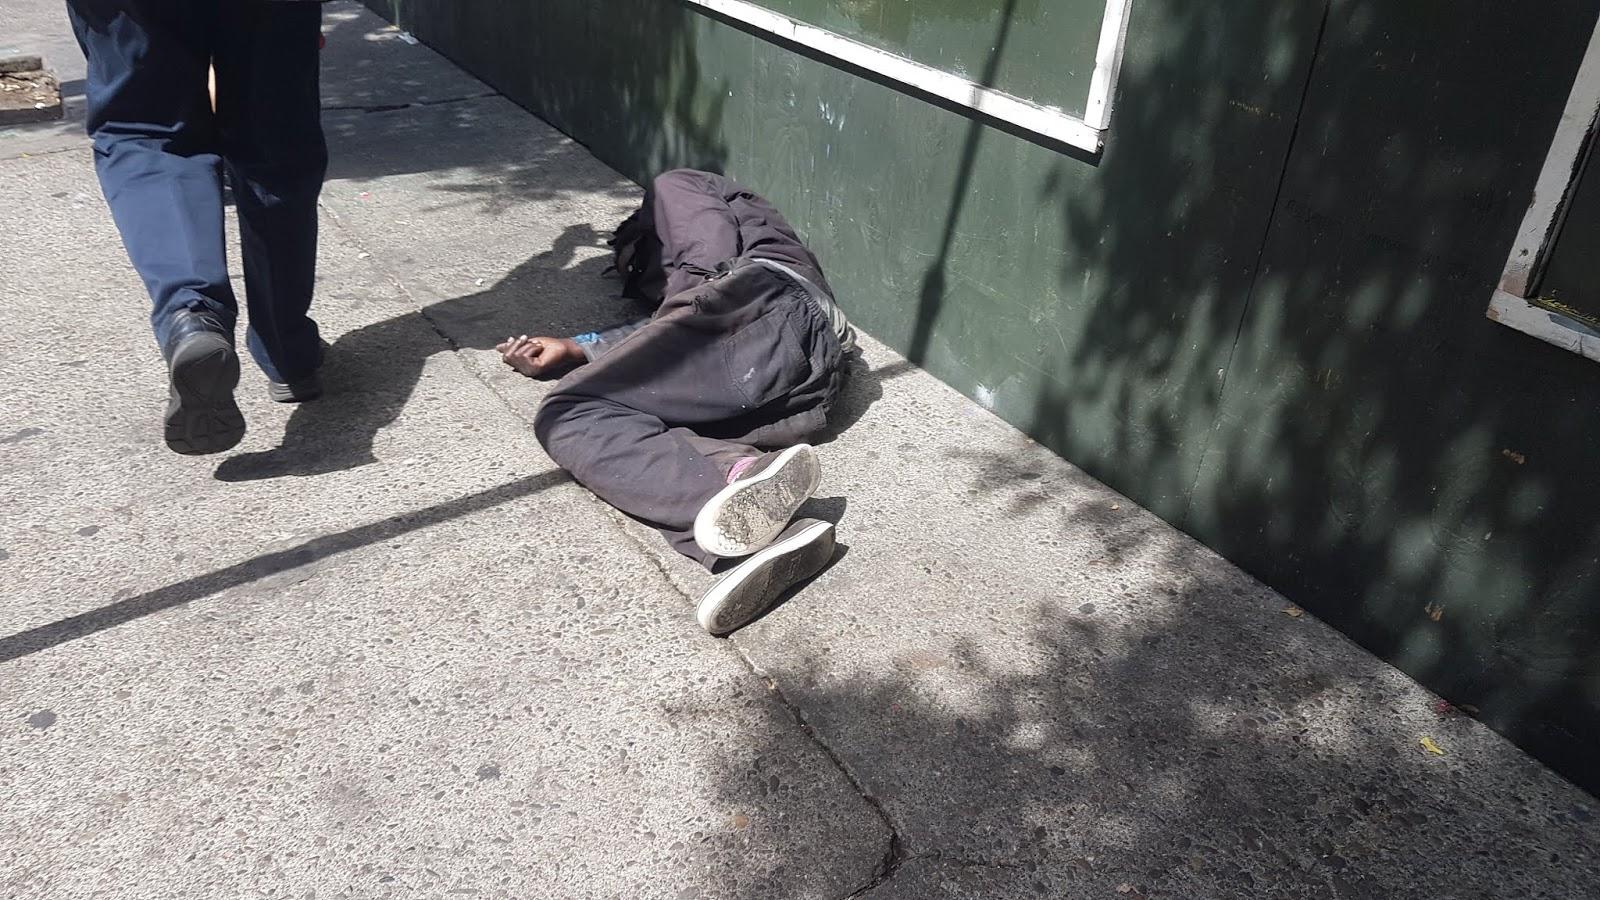 San Francisco casuale sesso